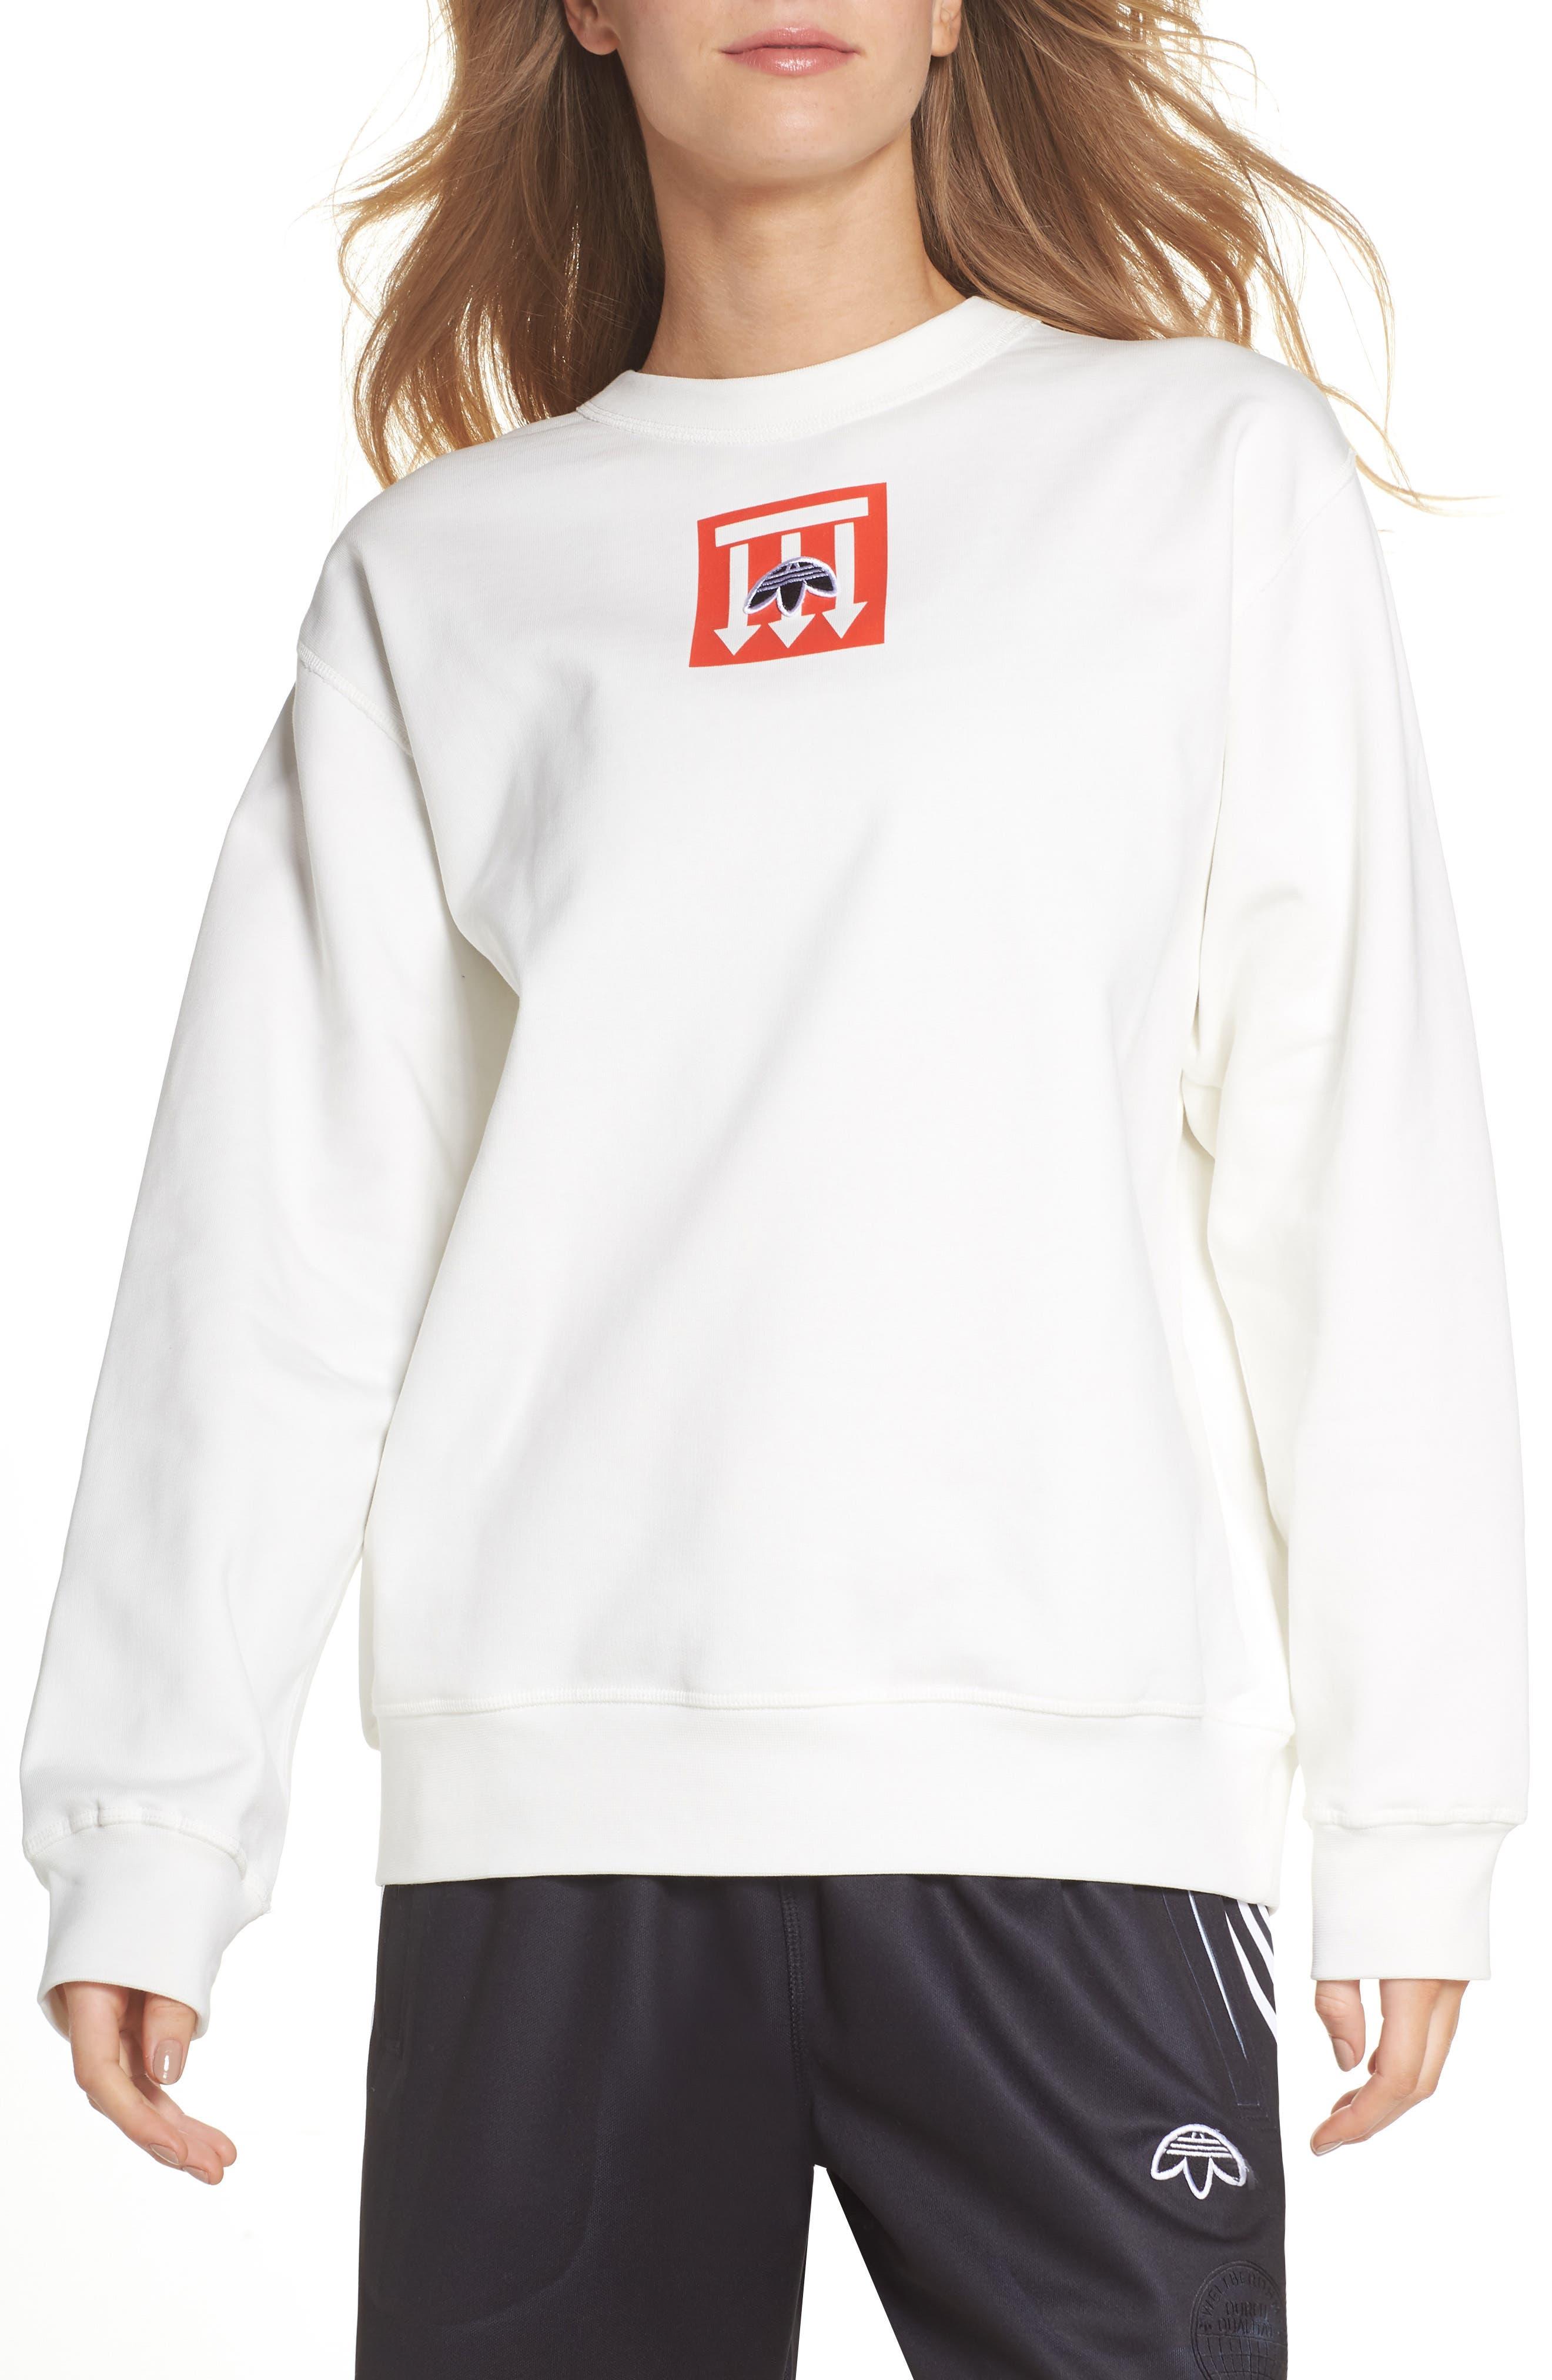 adidas x Alexander Wang Graphite Sweatshirt,                         Main,                         color, 900